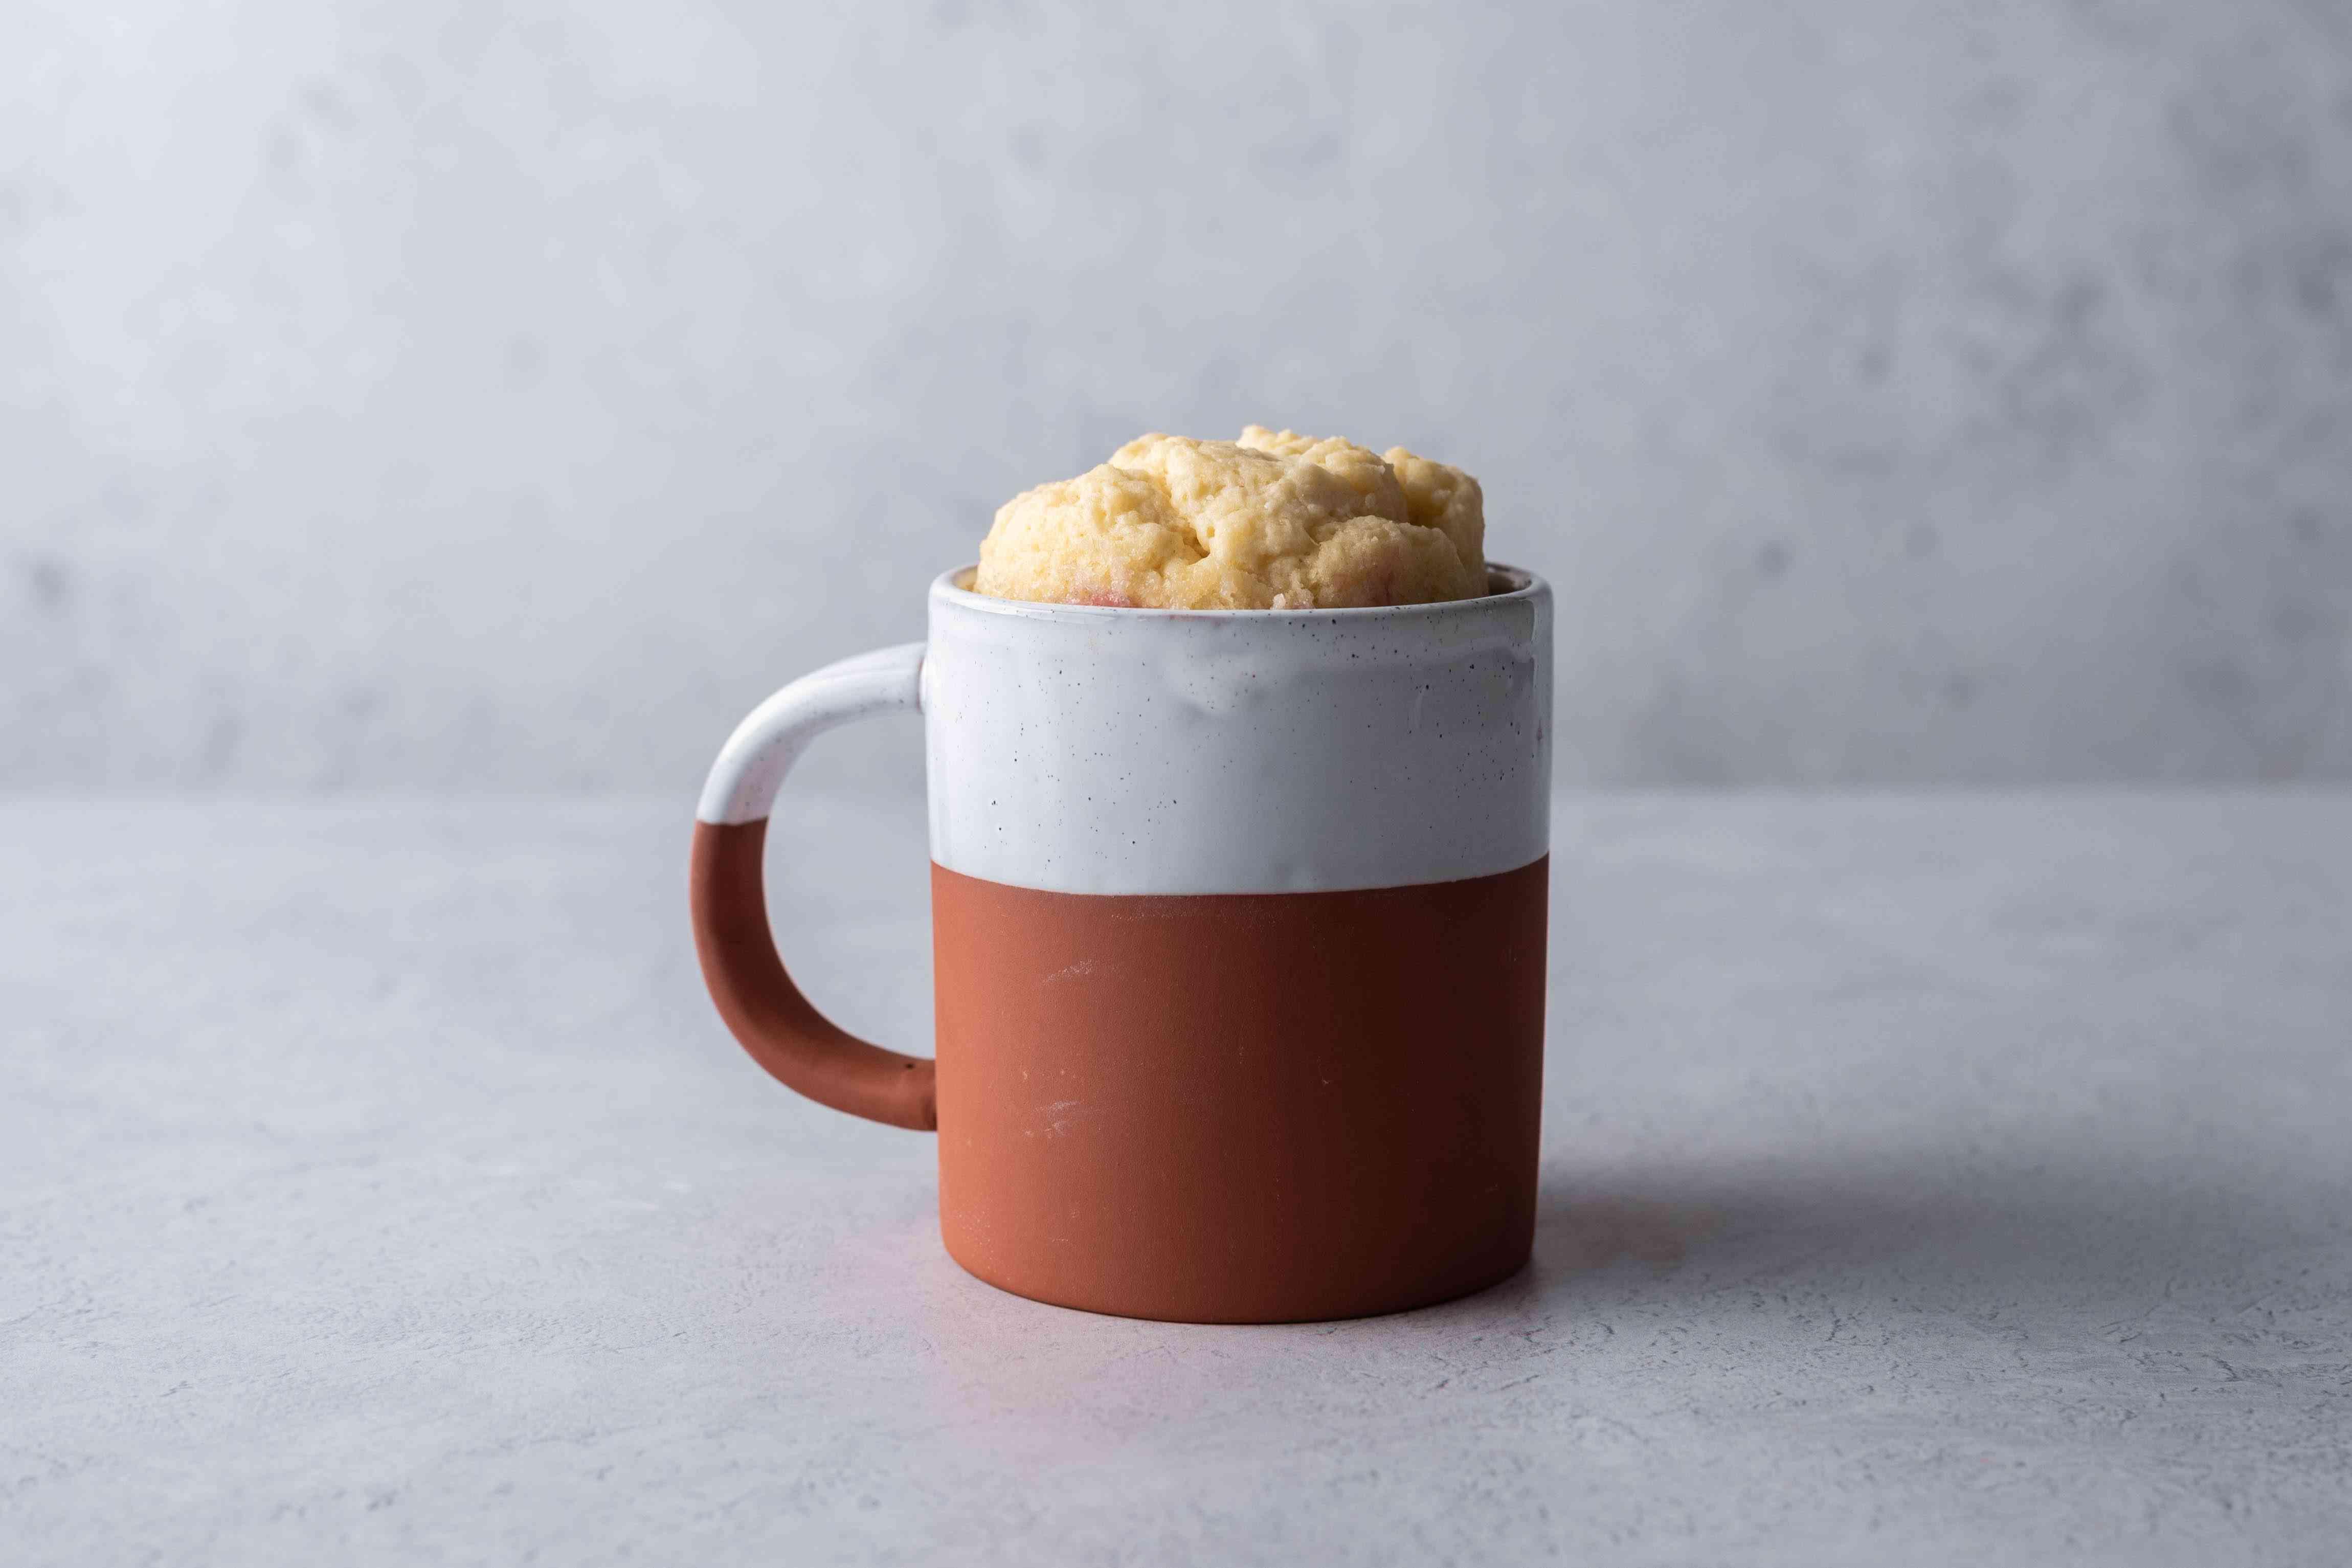 mug pie cooked